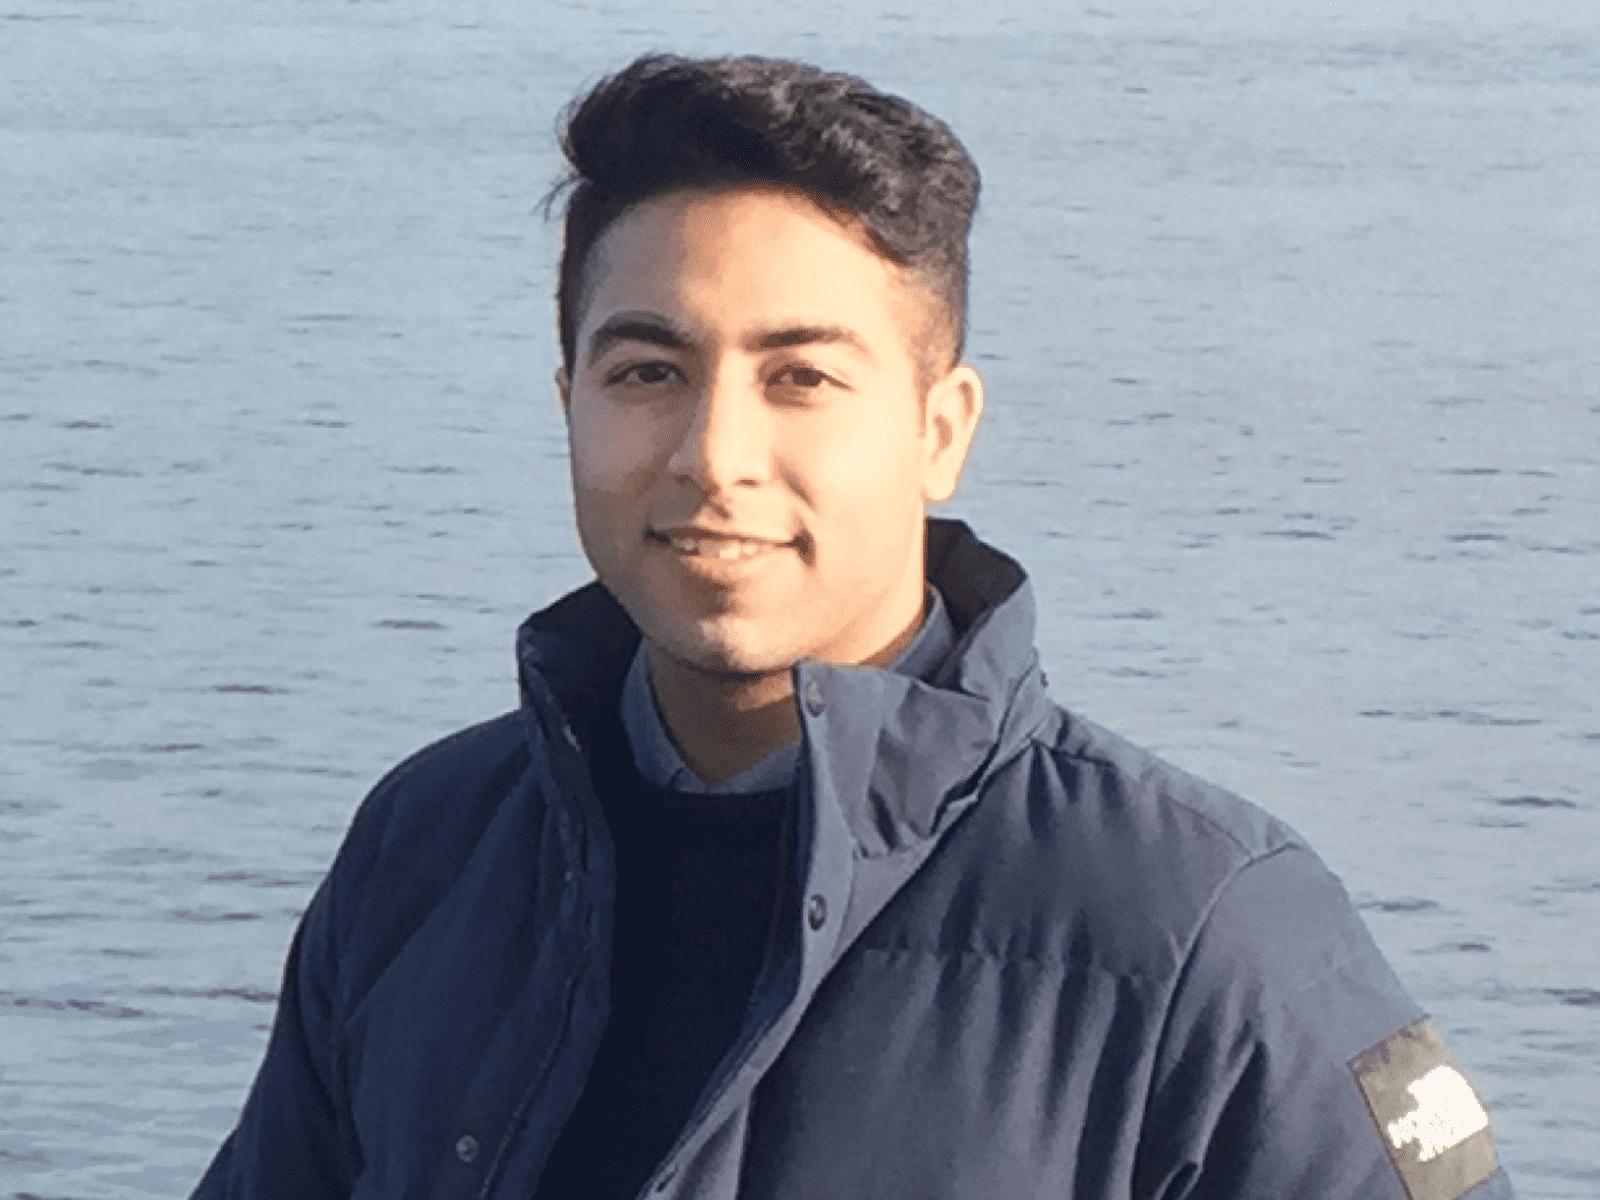 Nikhil from Orange, California, United States